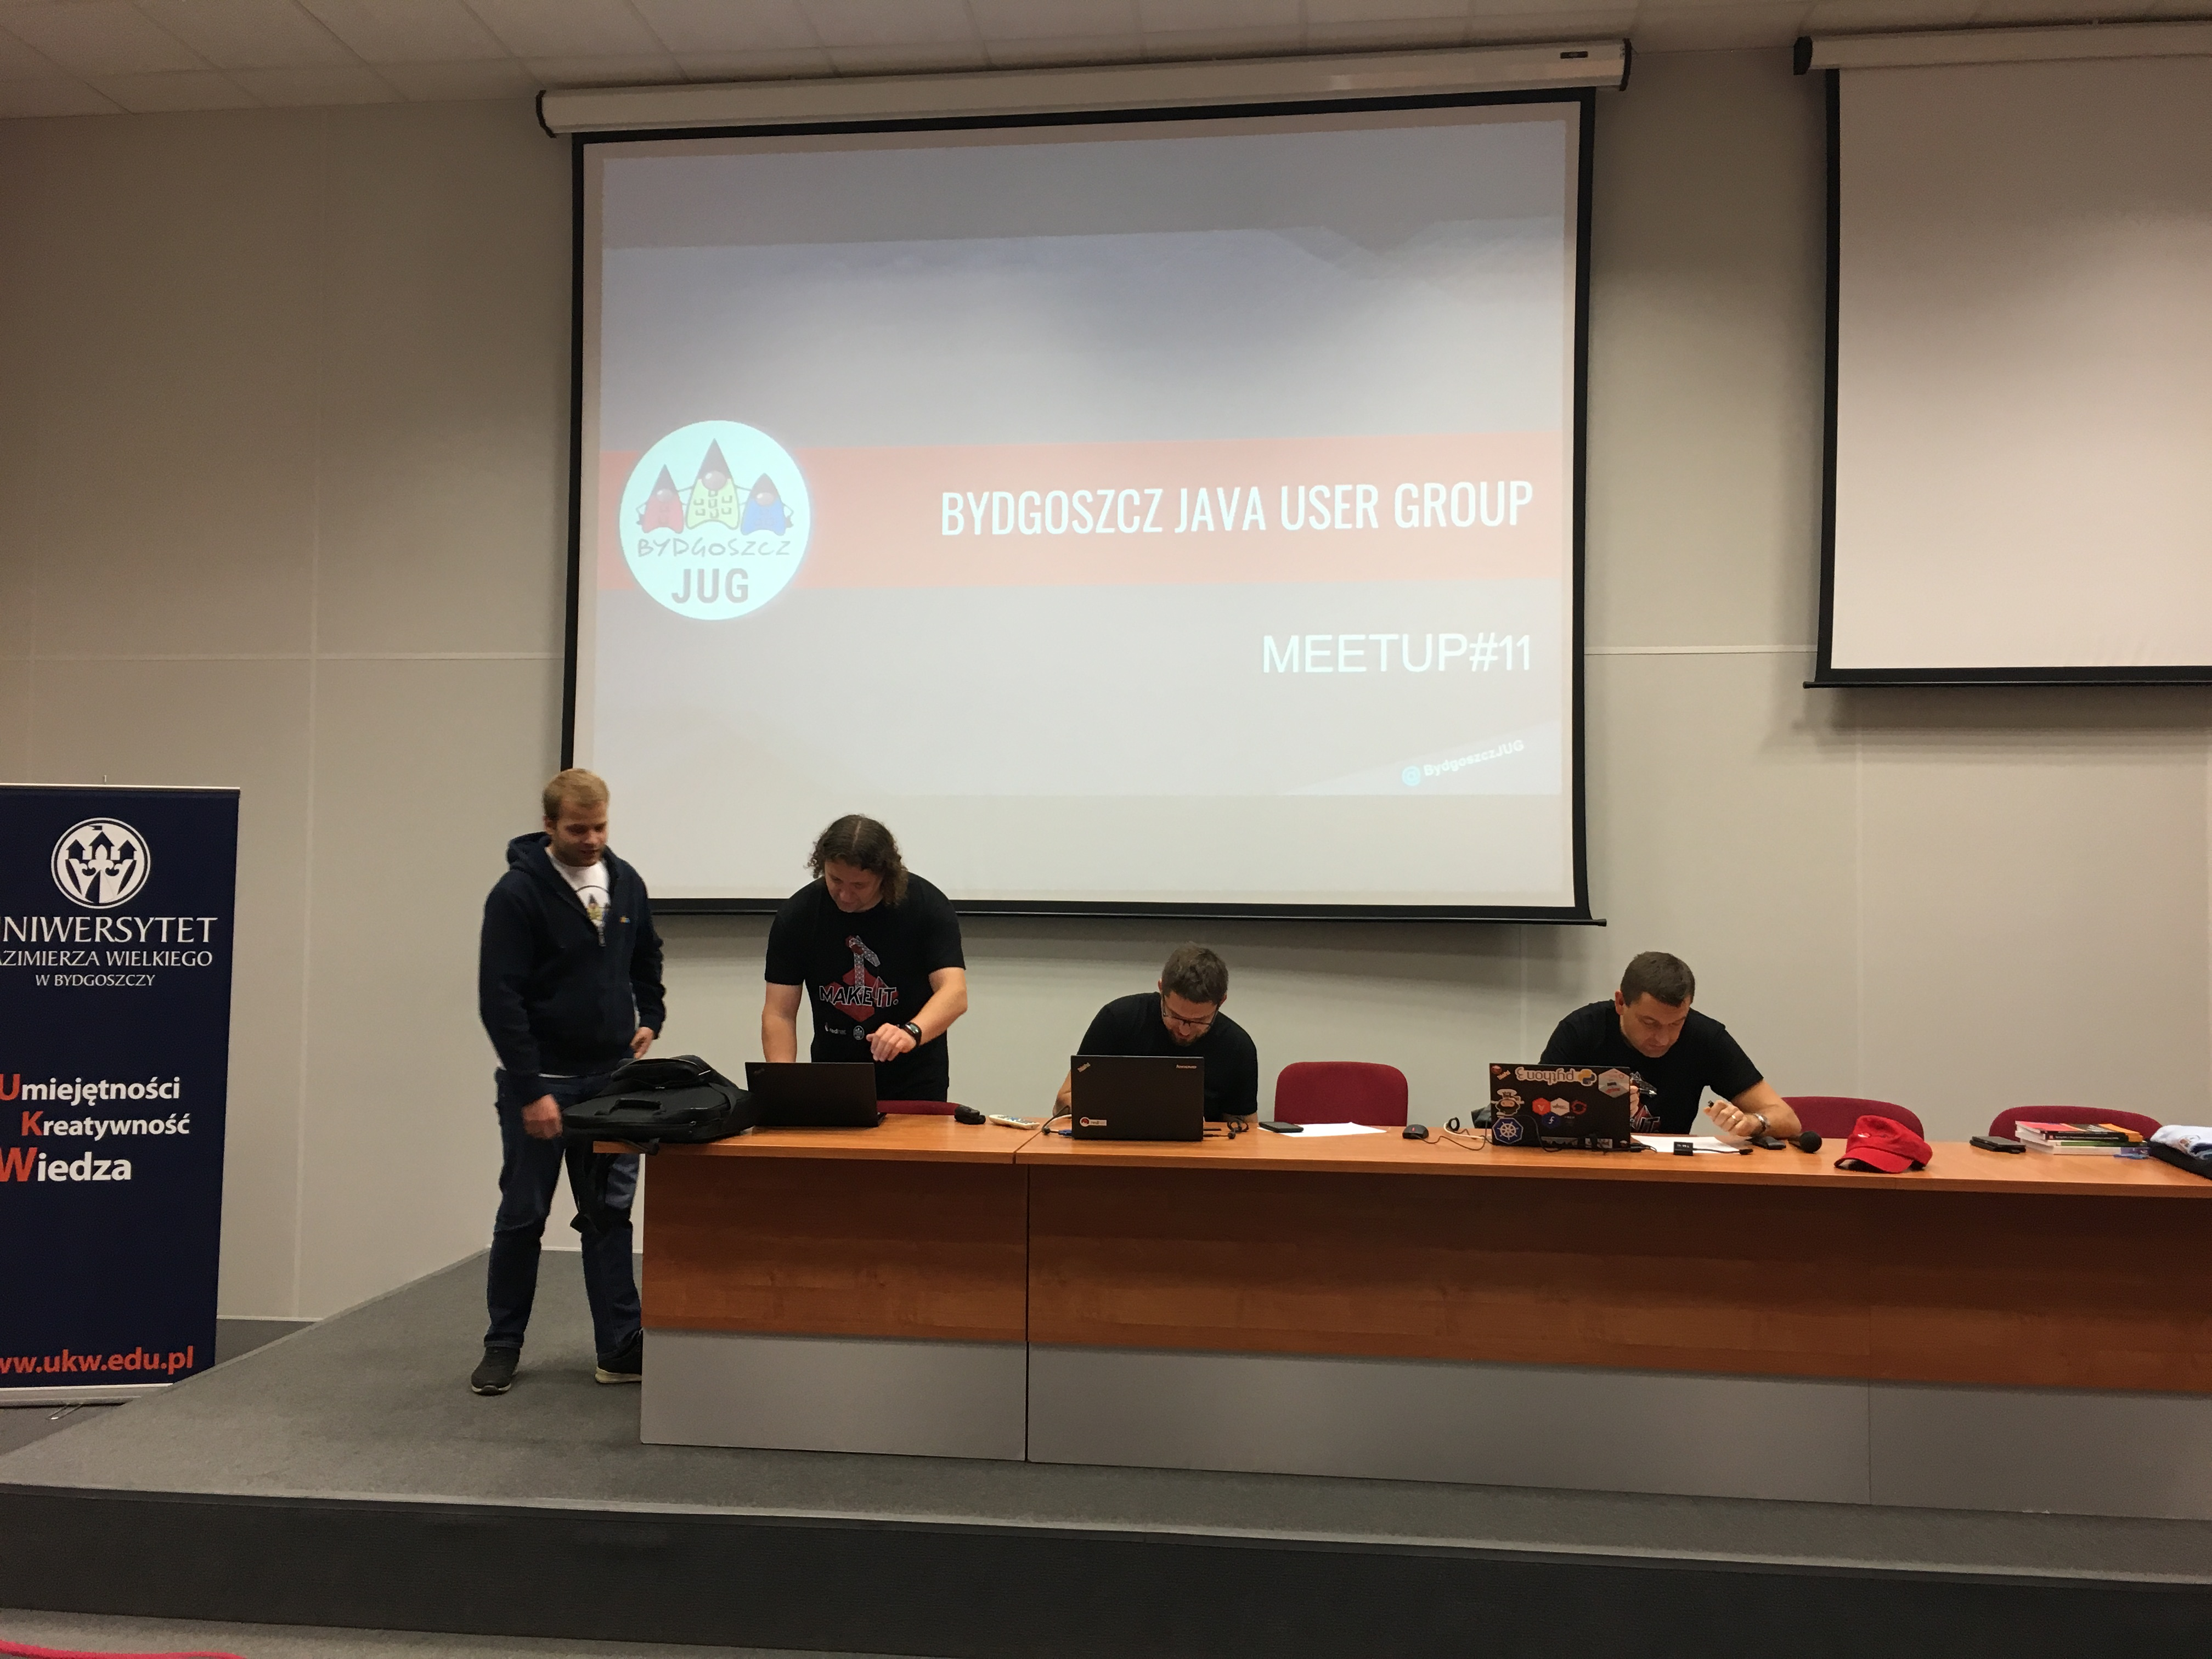 Bydgoszcz JUG – meetup #11